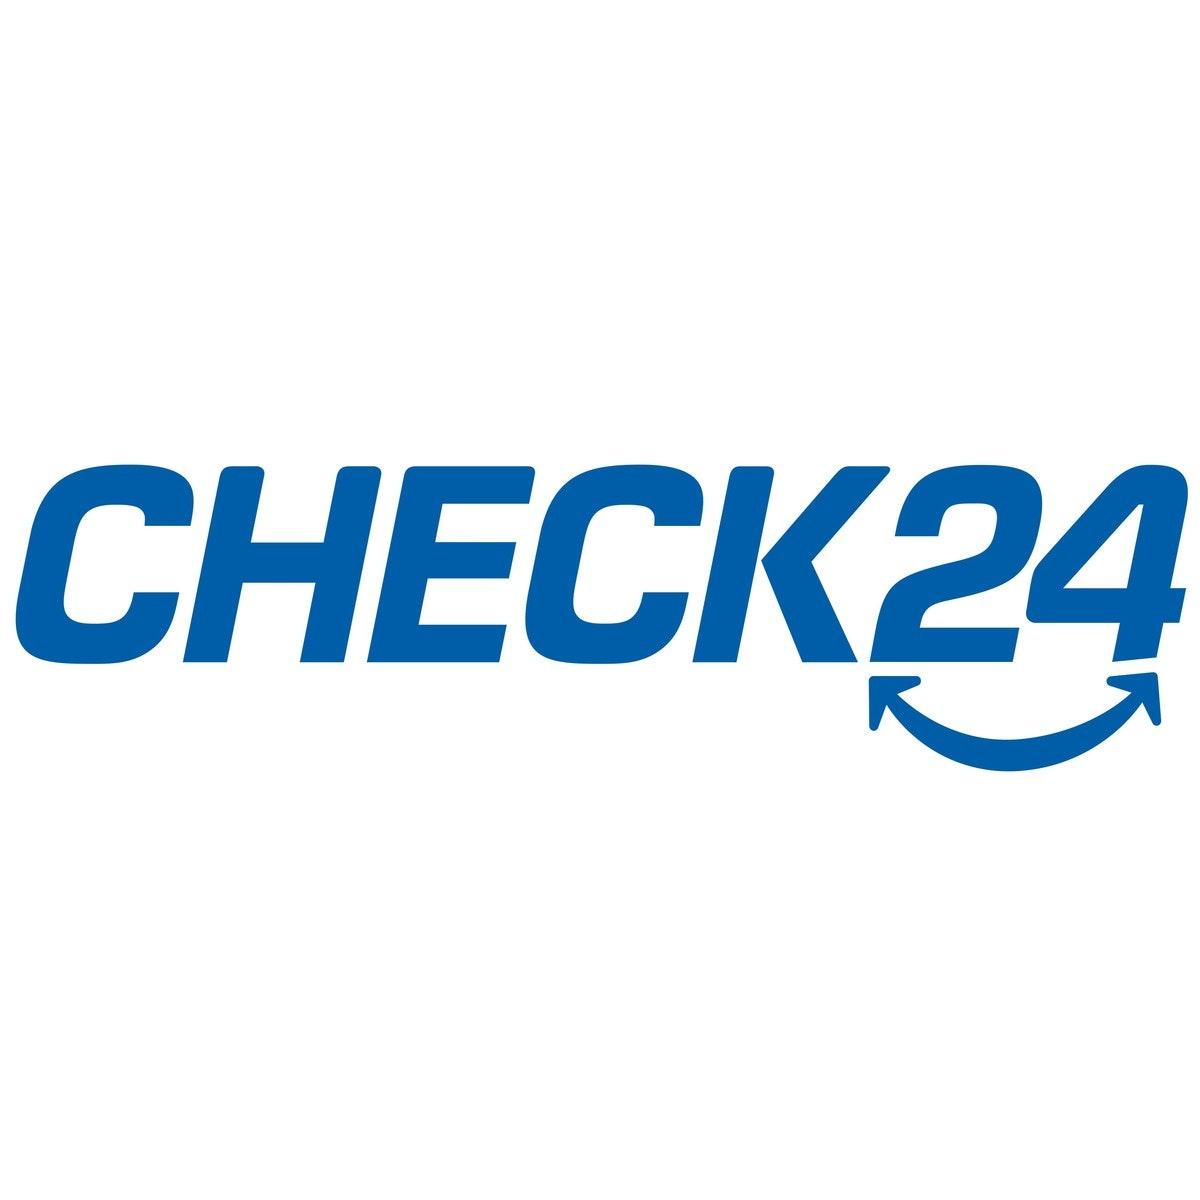 CHECK24 Media